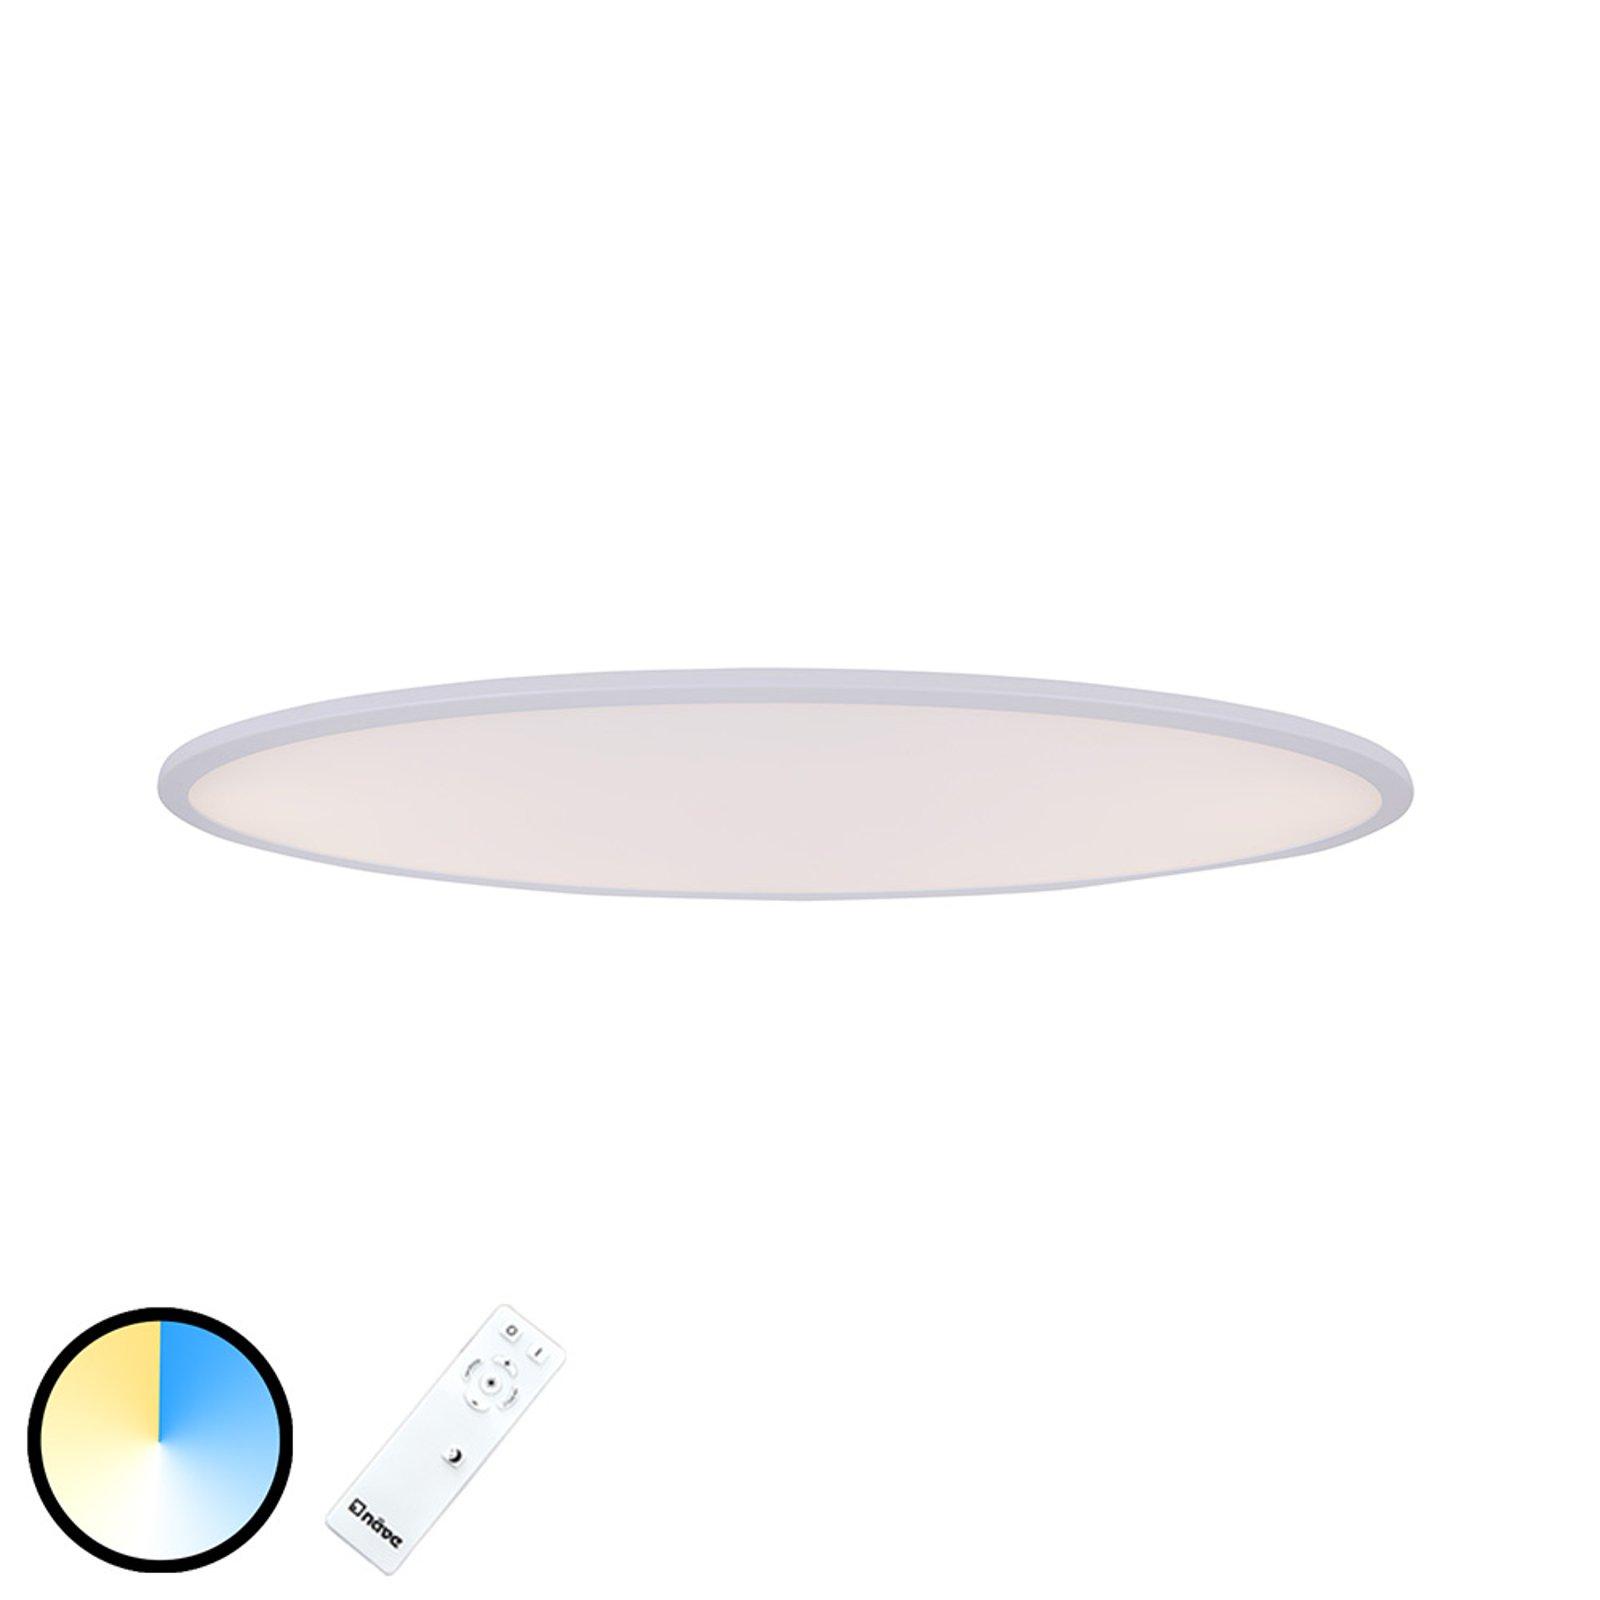 Amalfi LED-taklampe oval 100 cm x 40 cm